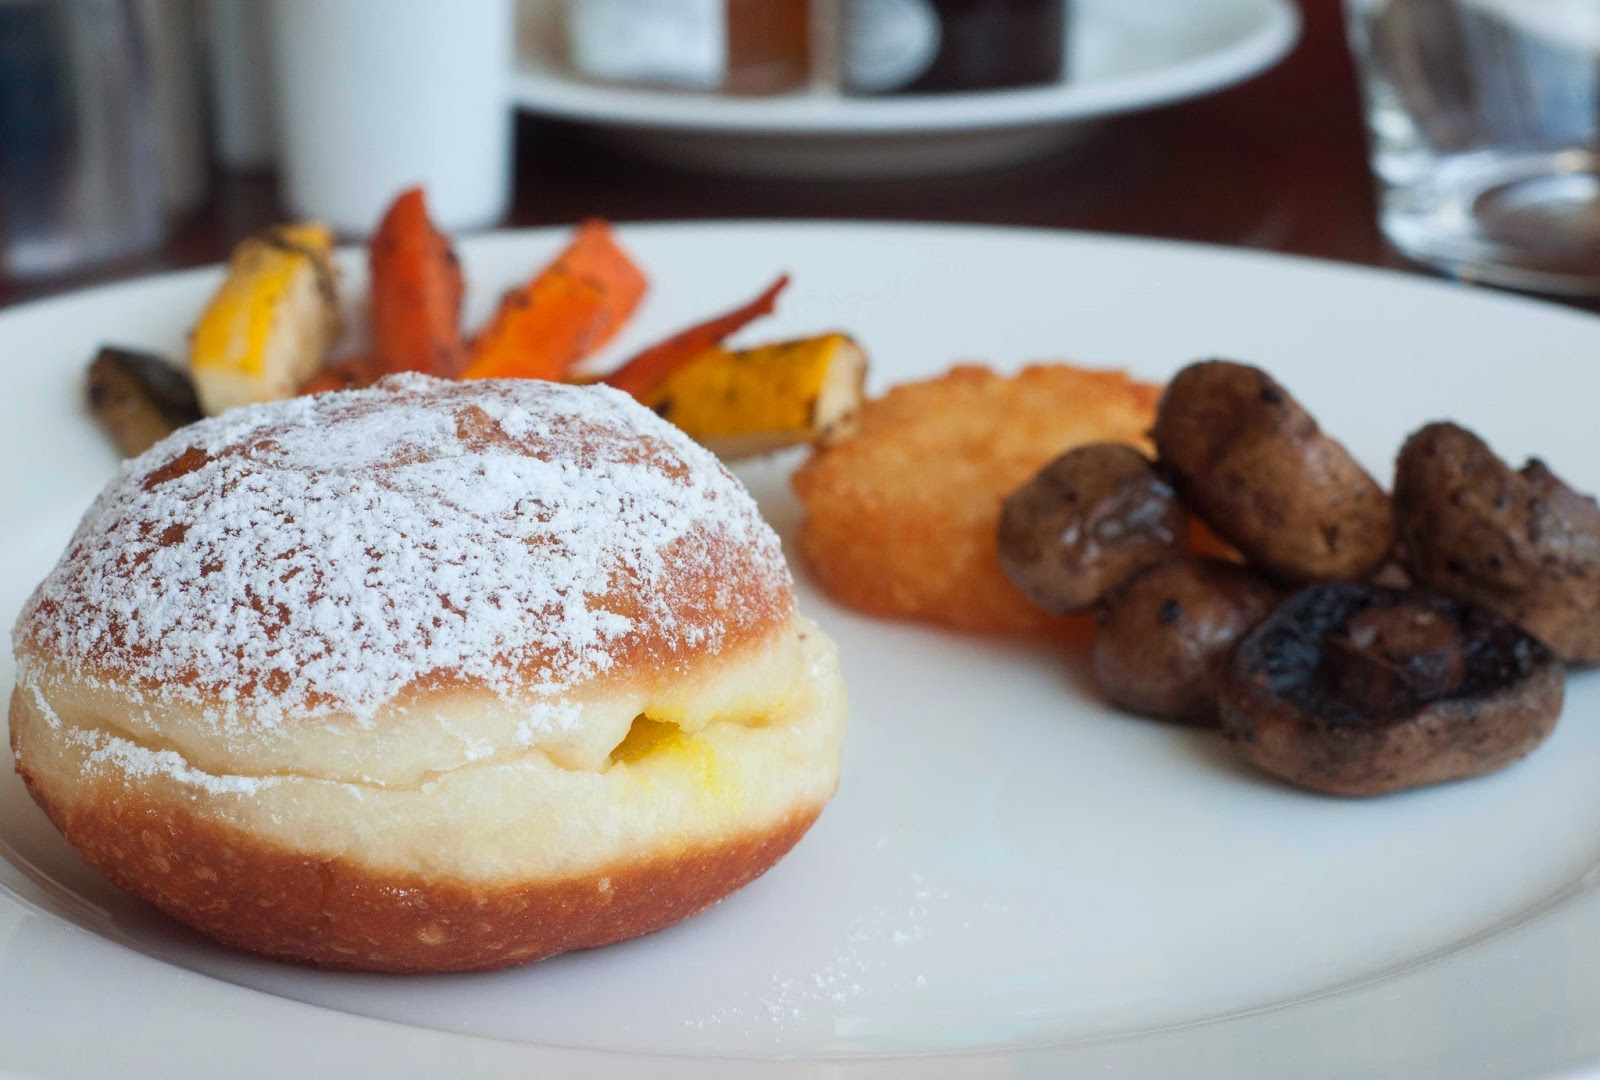 Breakfast Series - Hyatt Regency